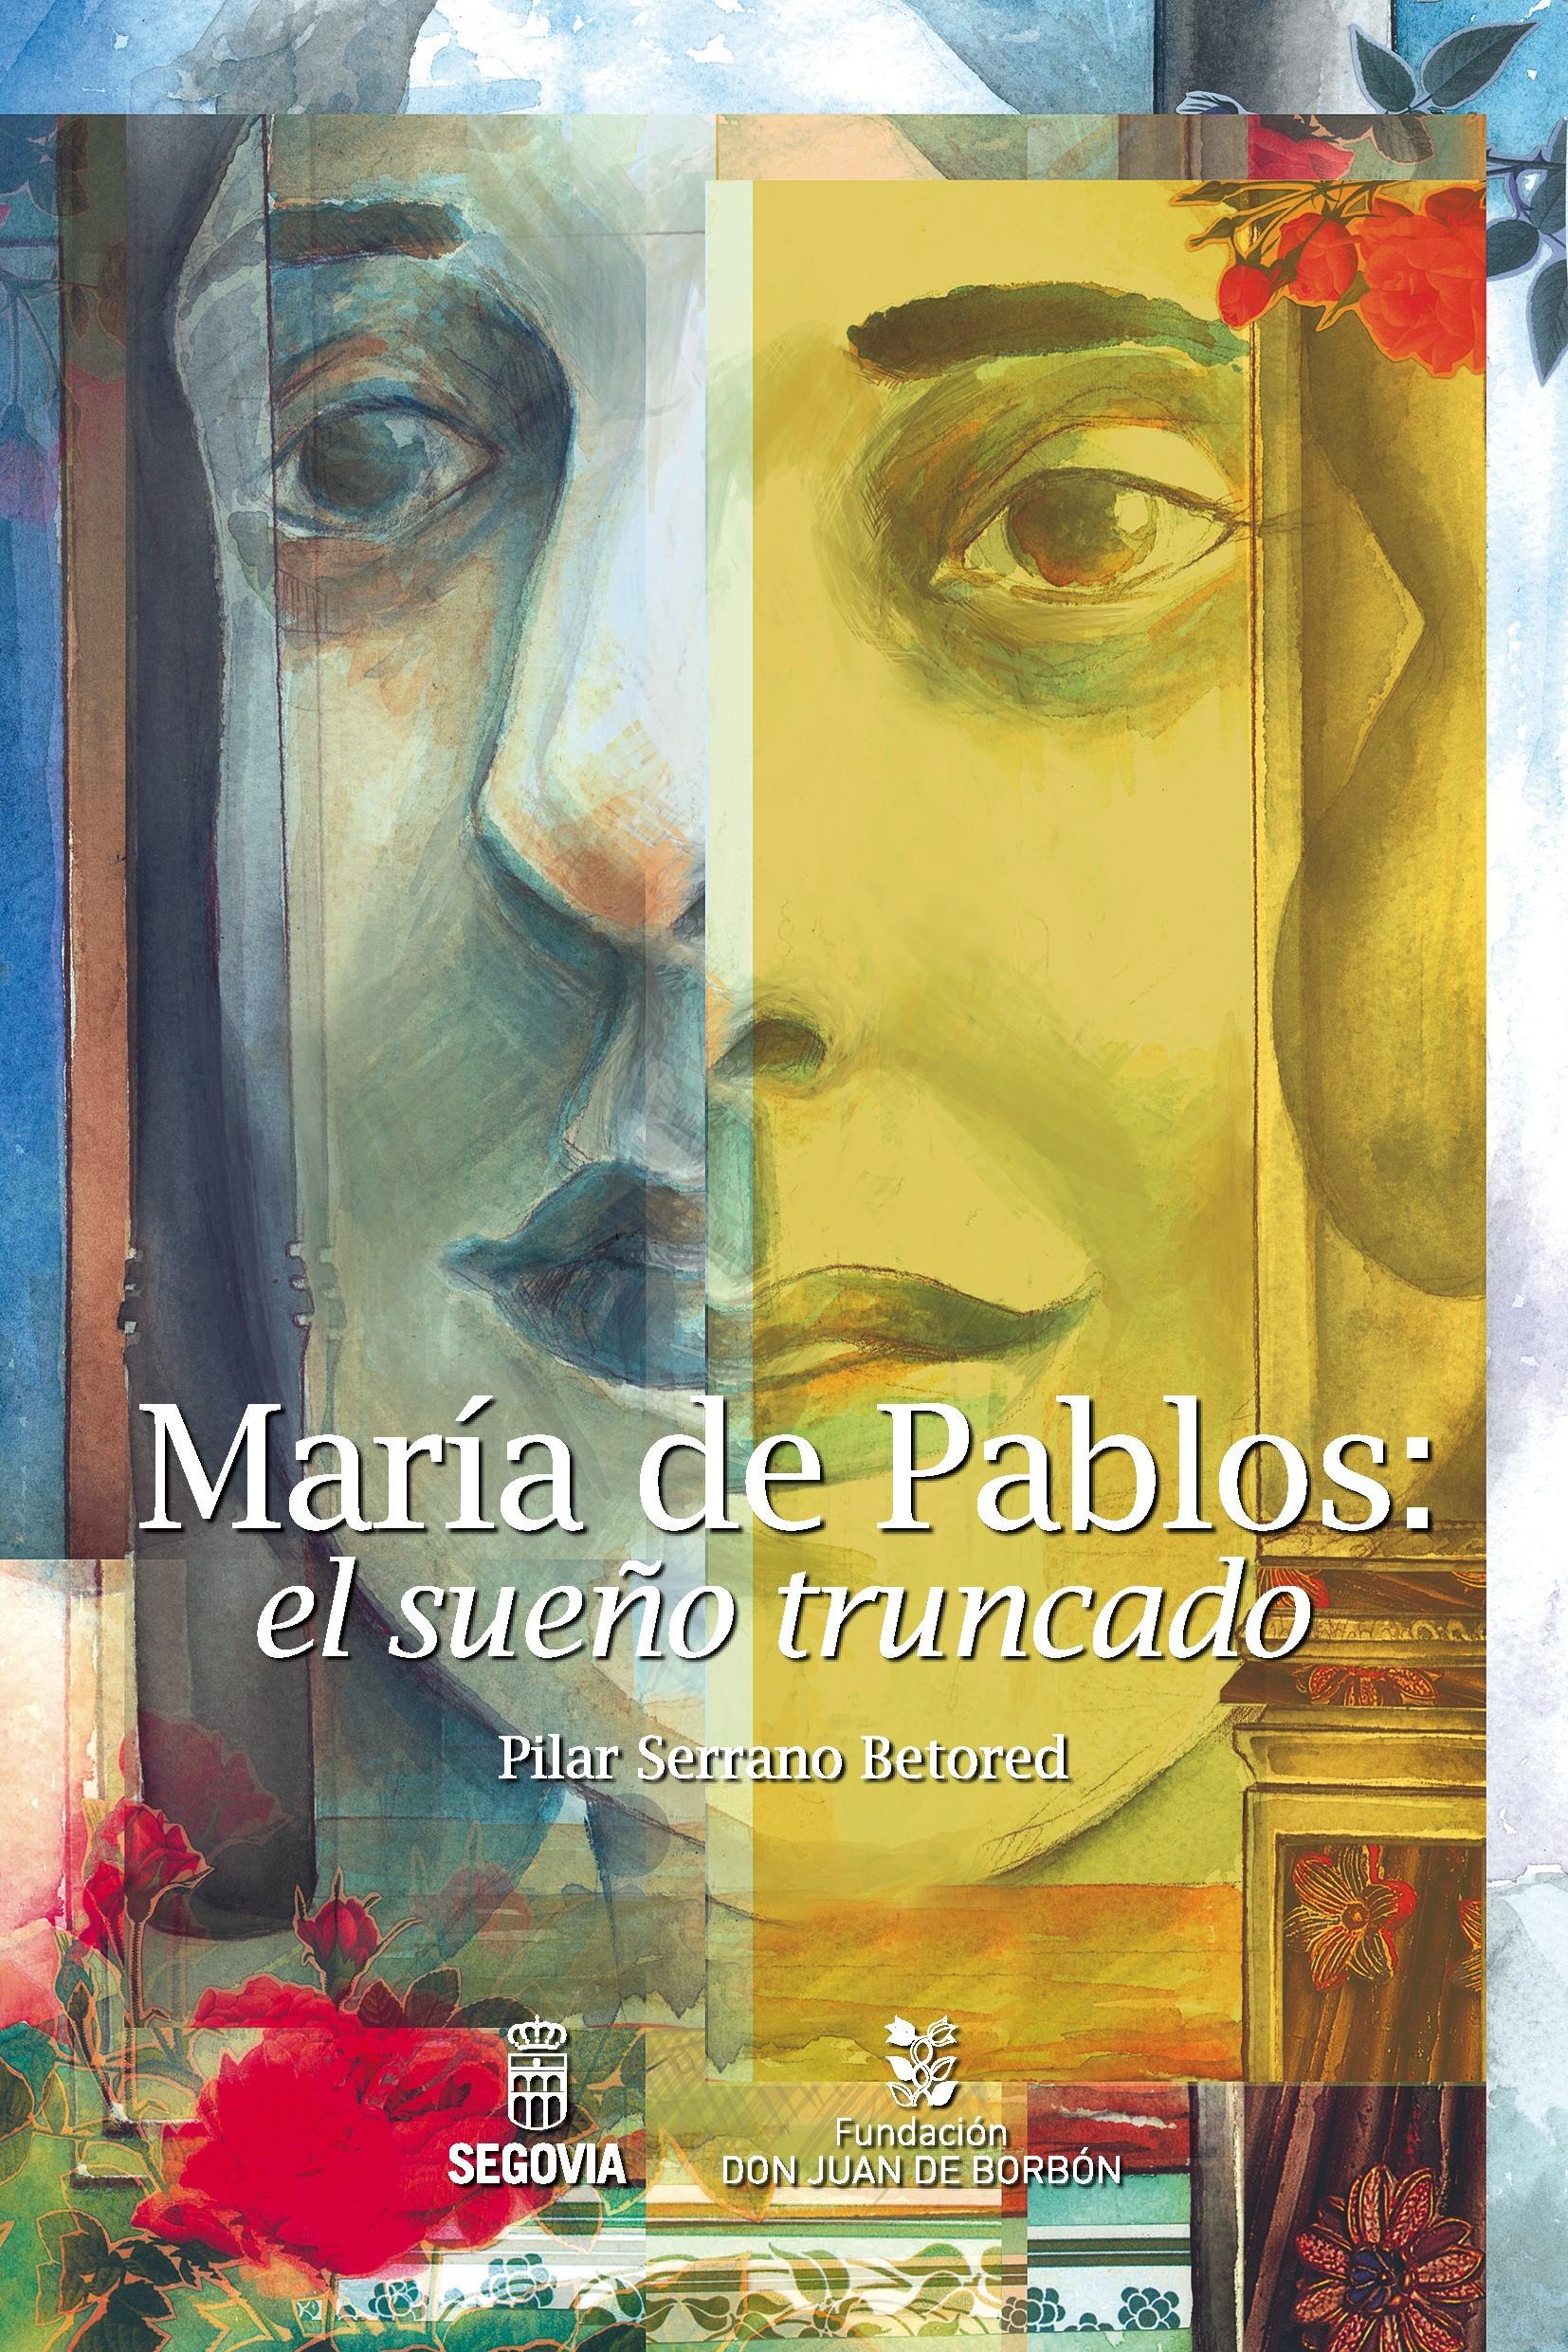 María de Pablos - Fundación Don Juan De Borbón